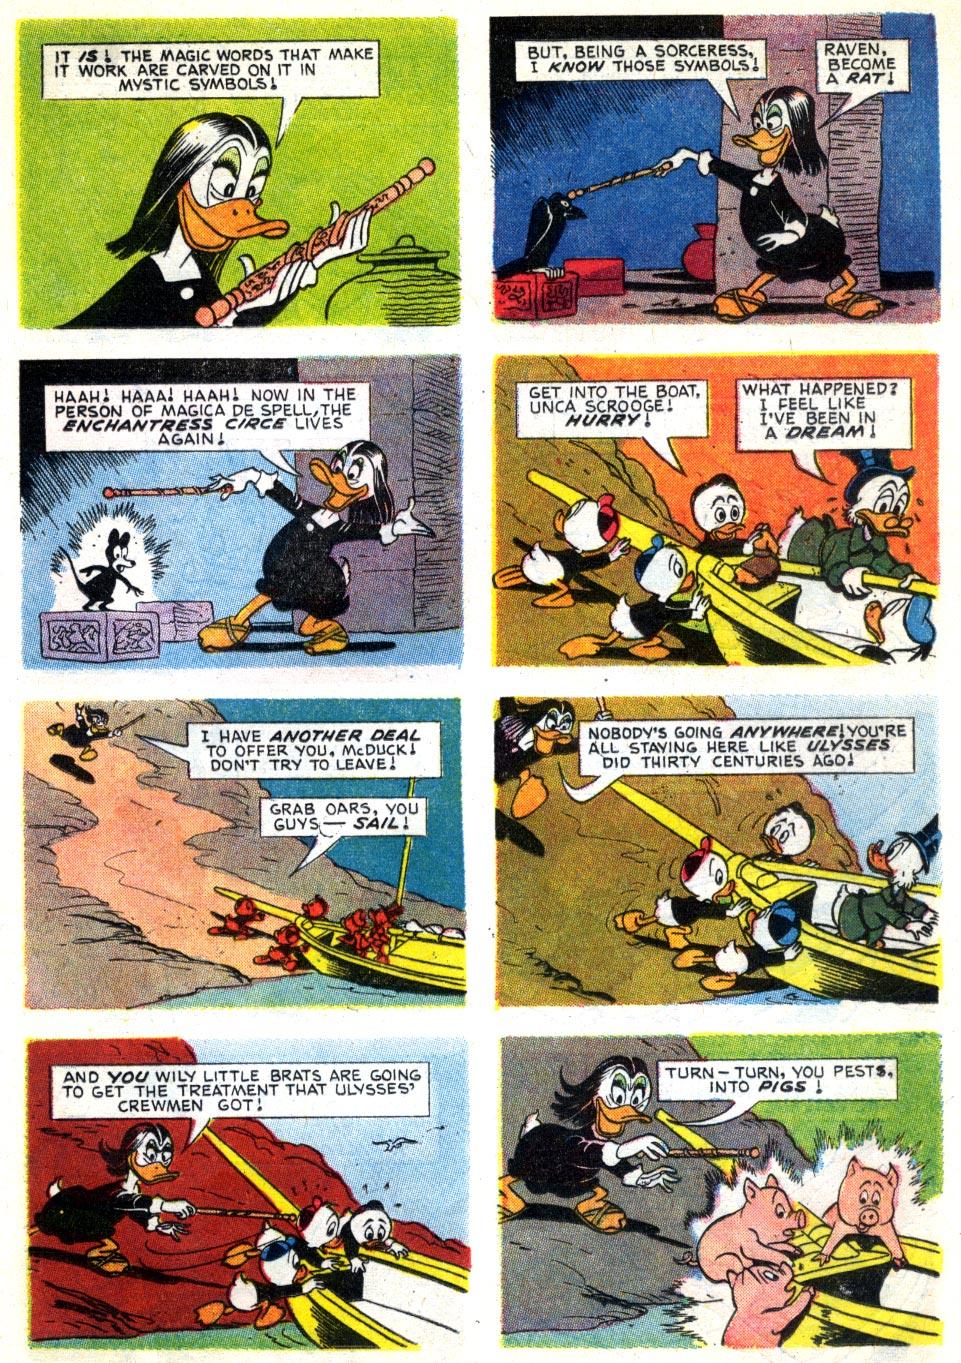 (1953) Issue #329 </opti #365 - English 13